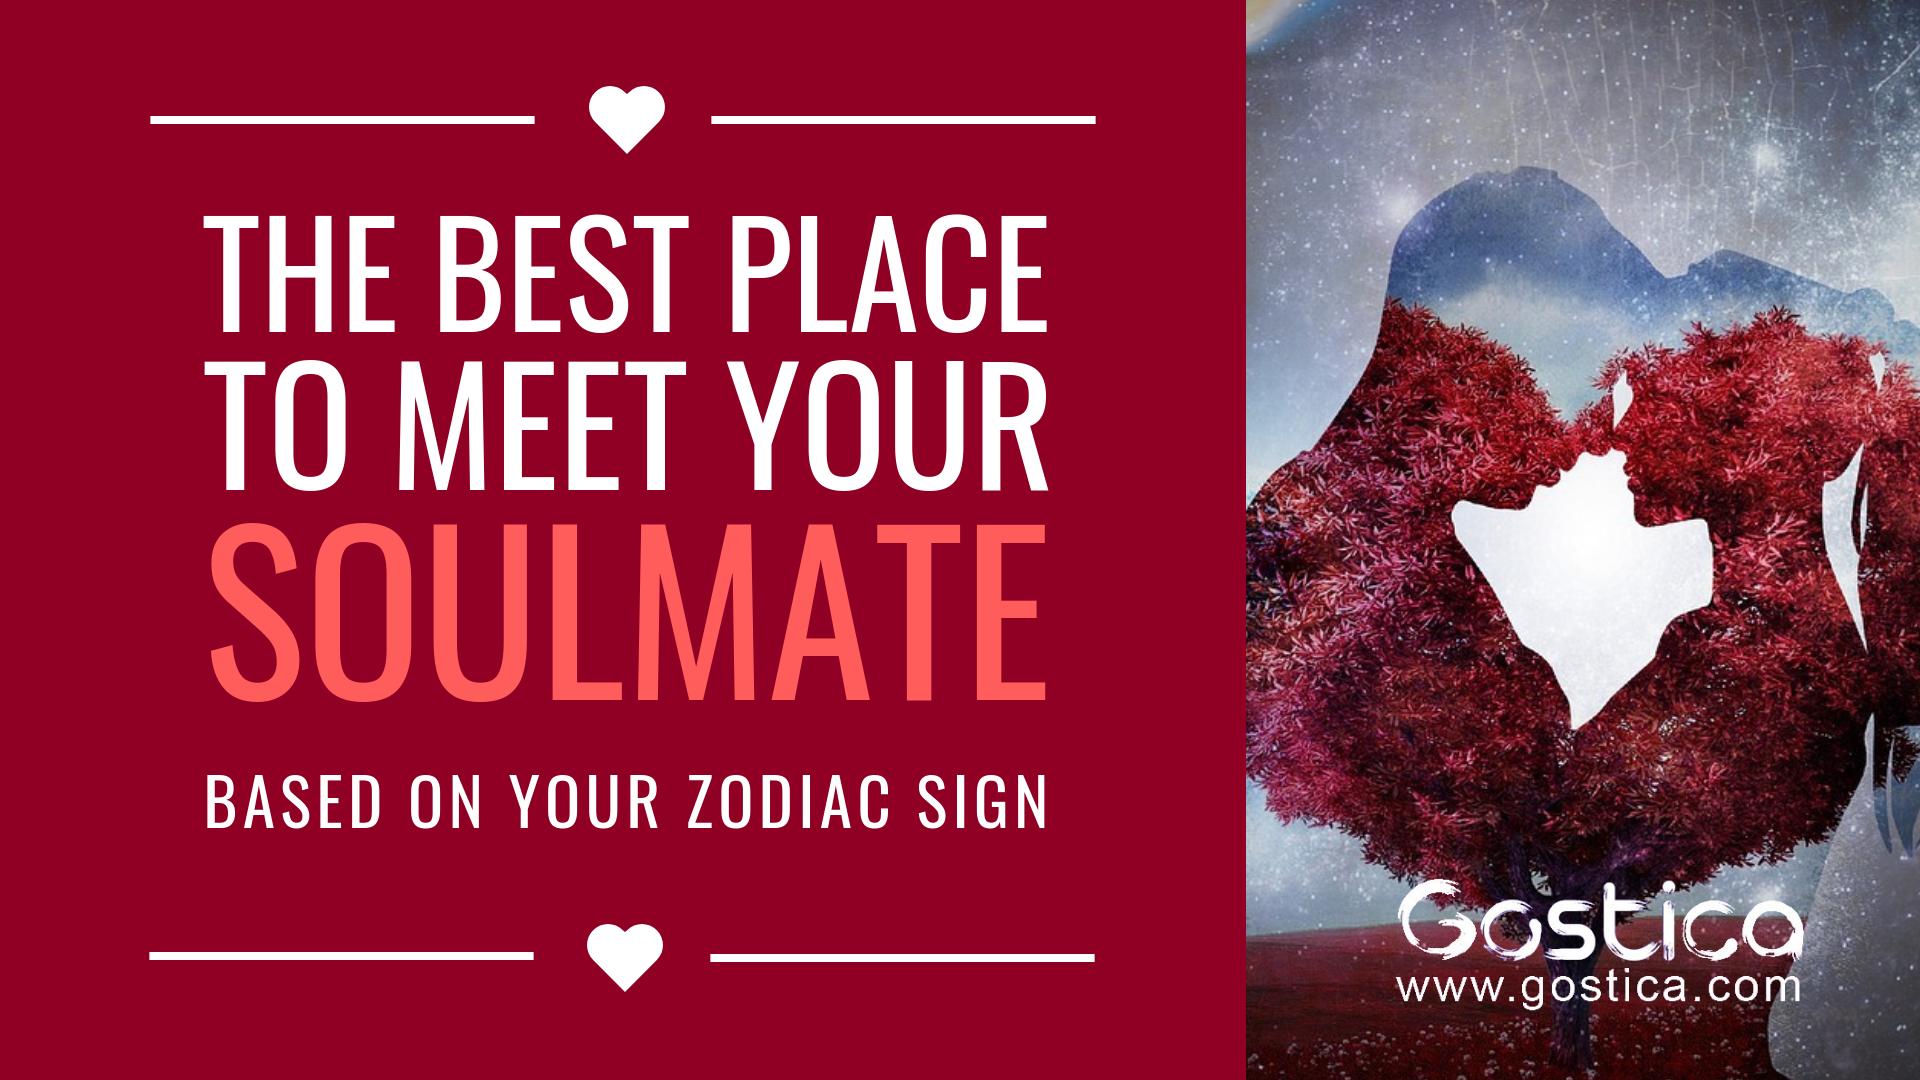 soulmate, zodiac sign